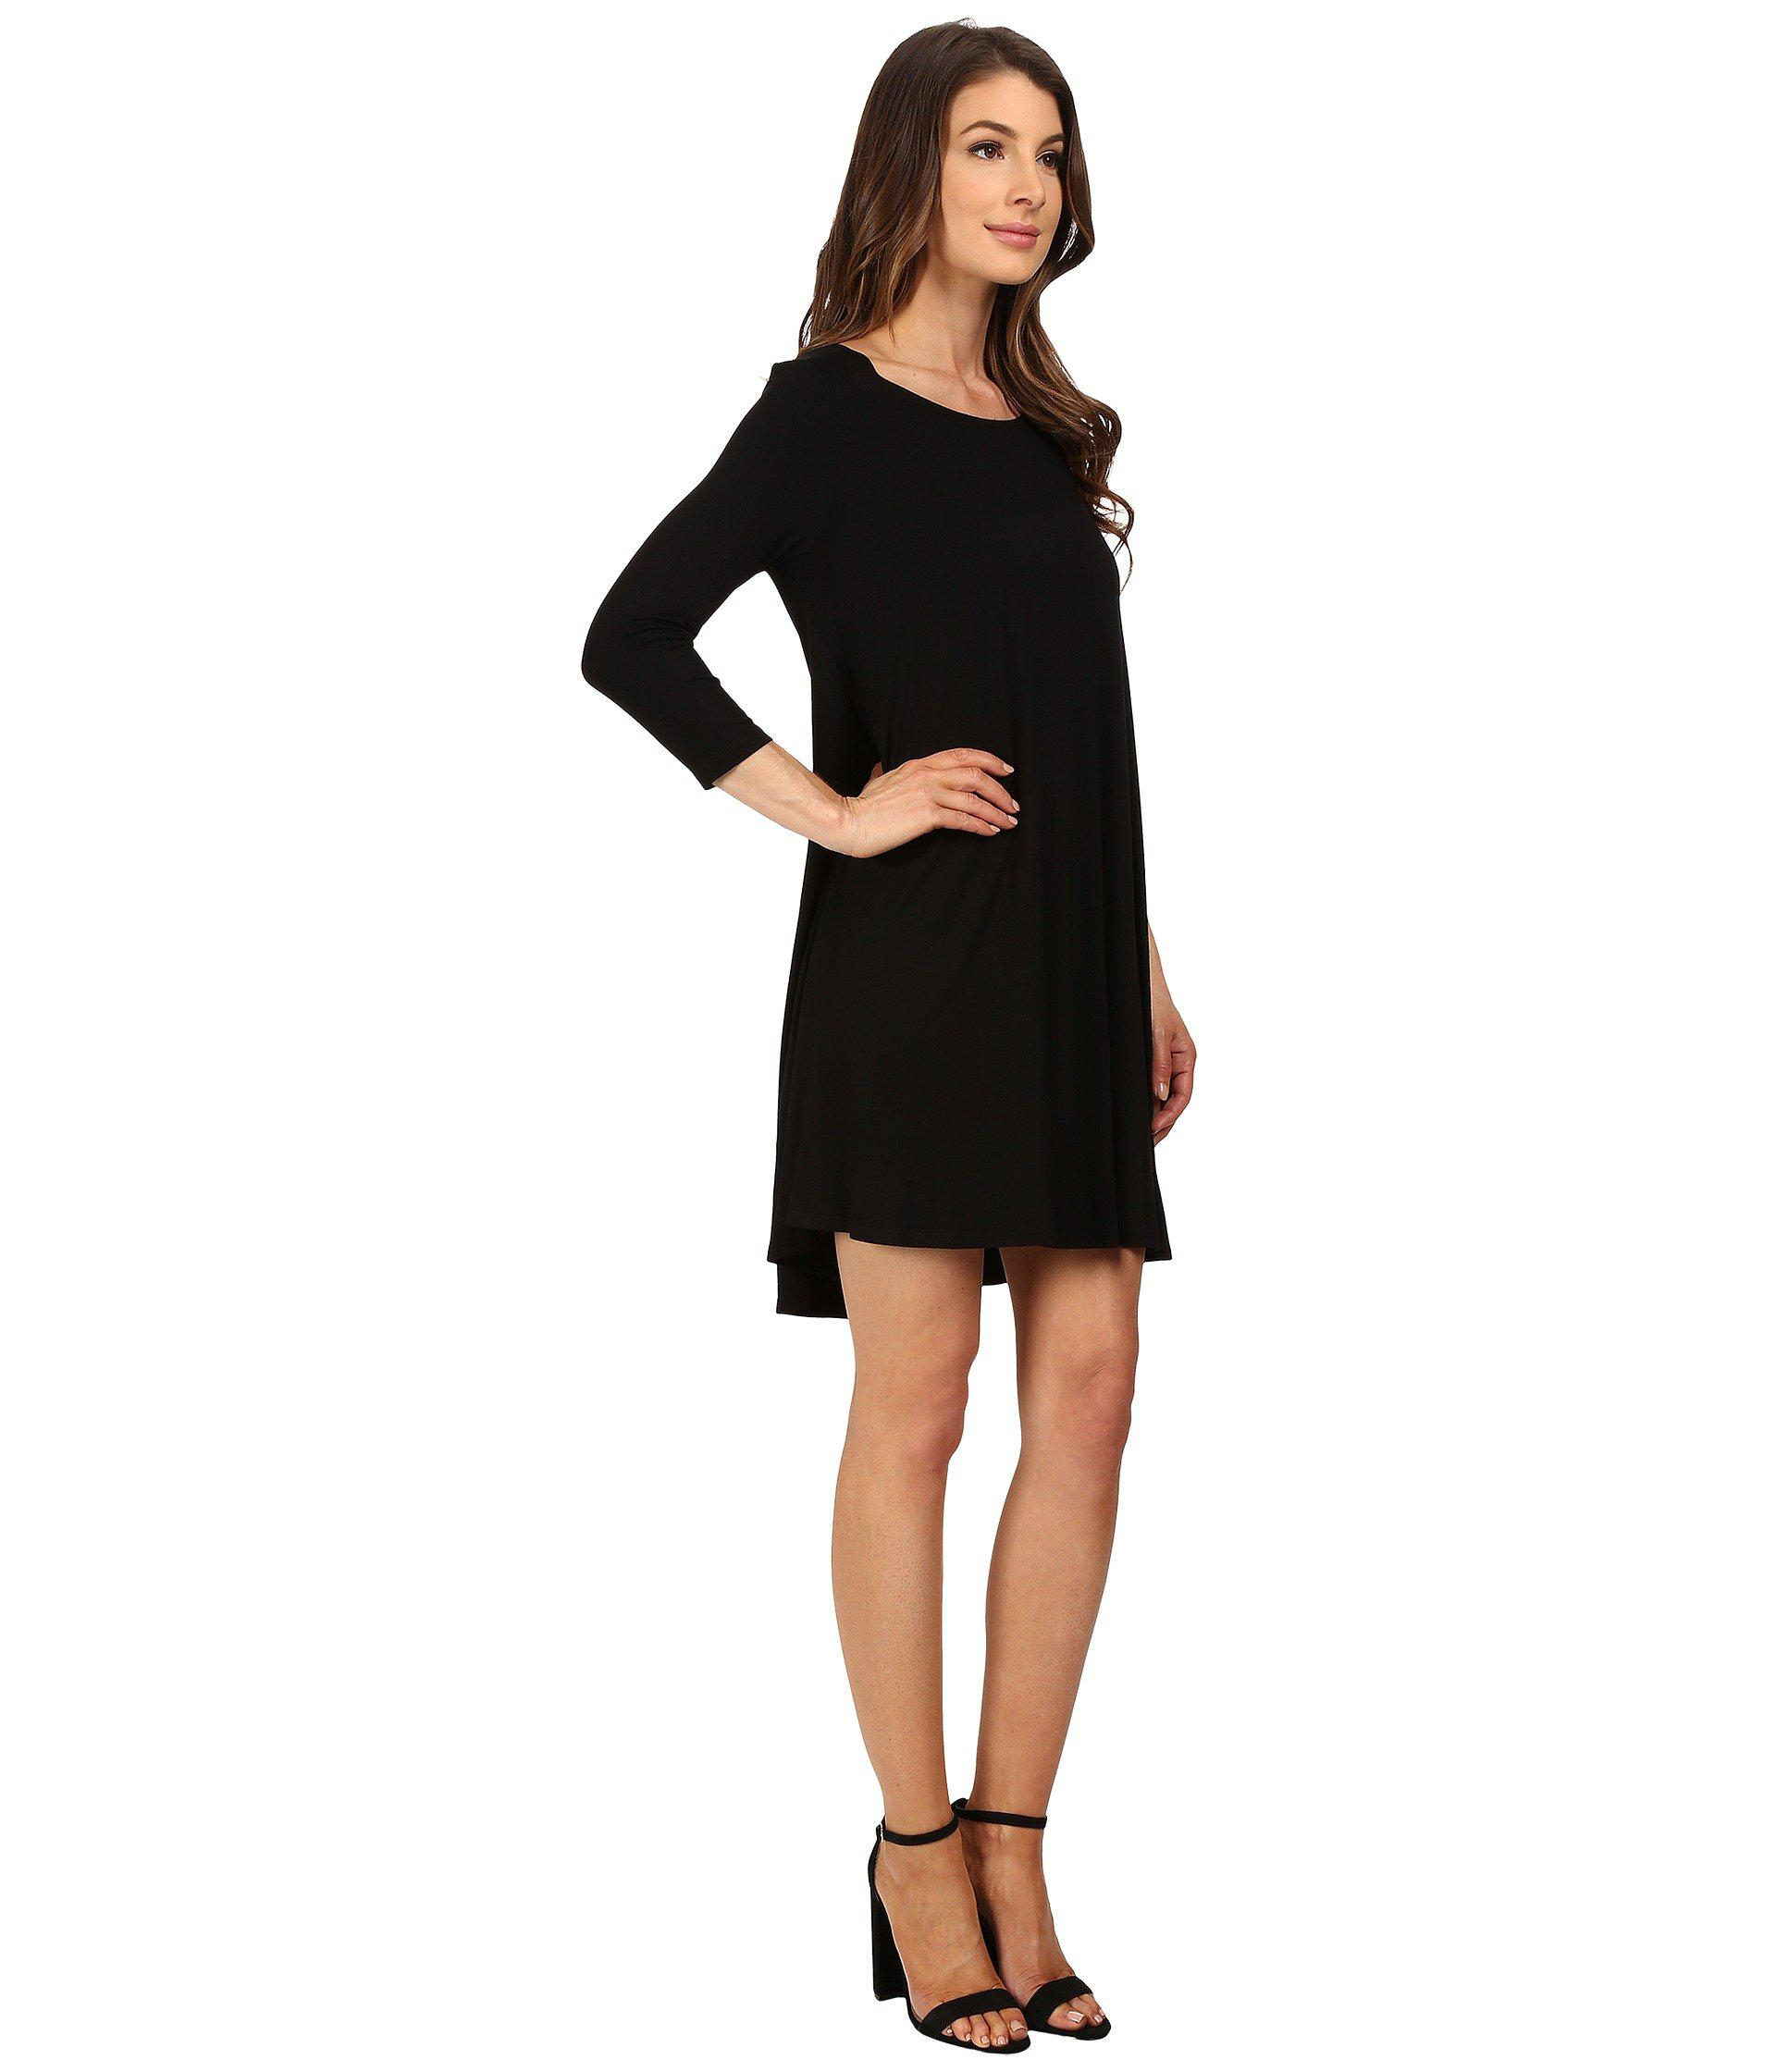 b834ea515be Lyst - Karen Kane 3 4 Sleeve Maggie Trapeze Dress in Black - Save 25%